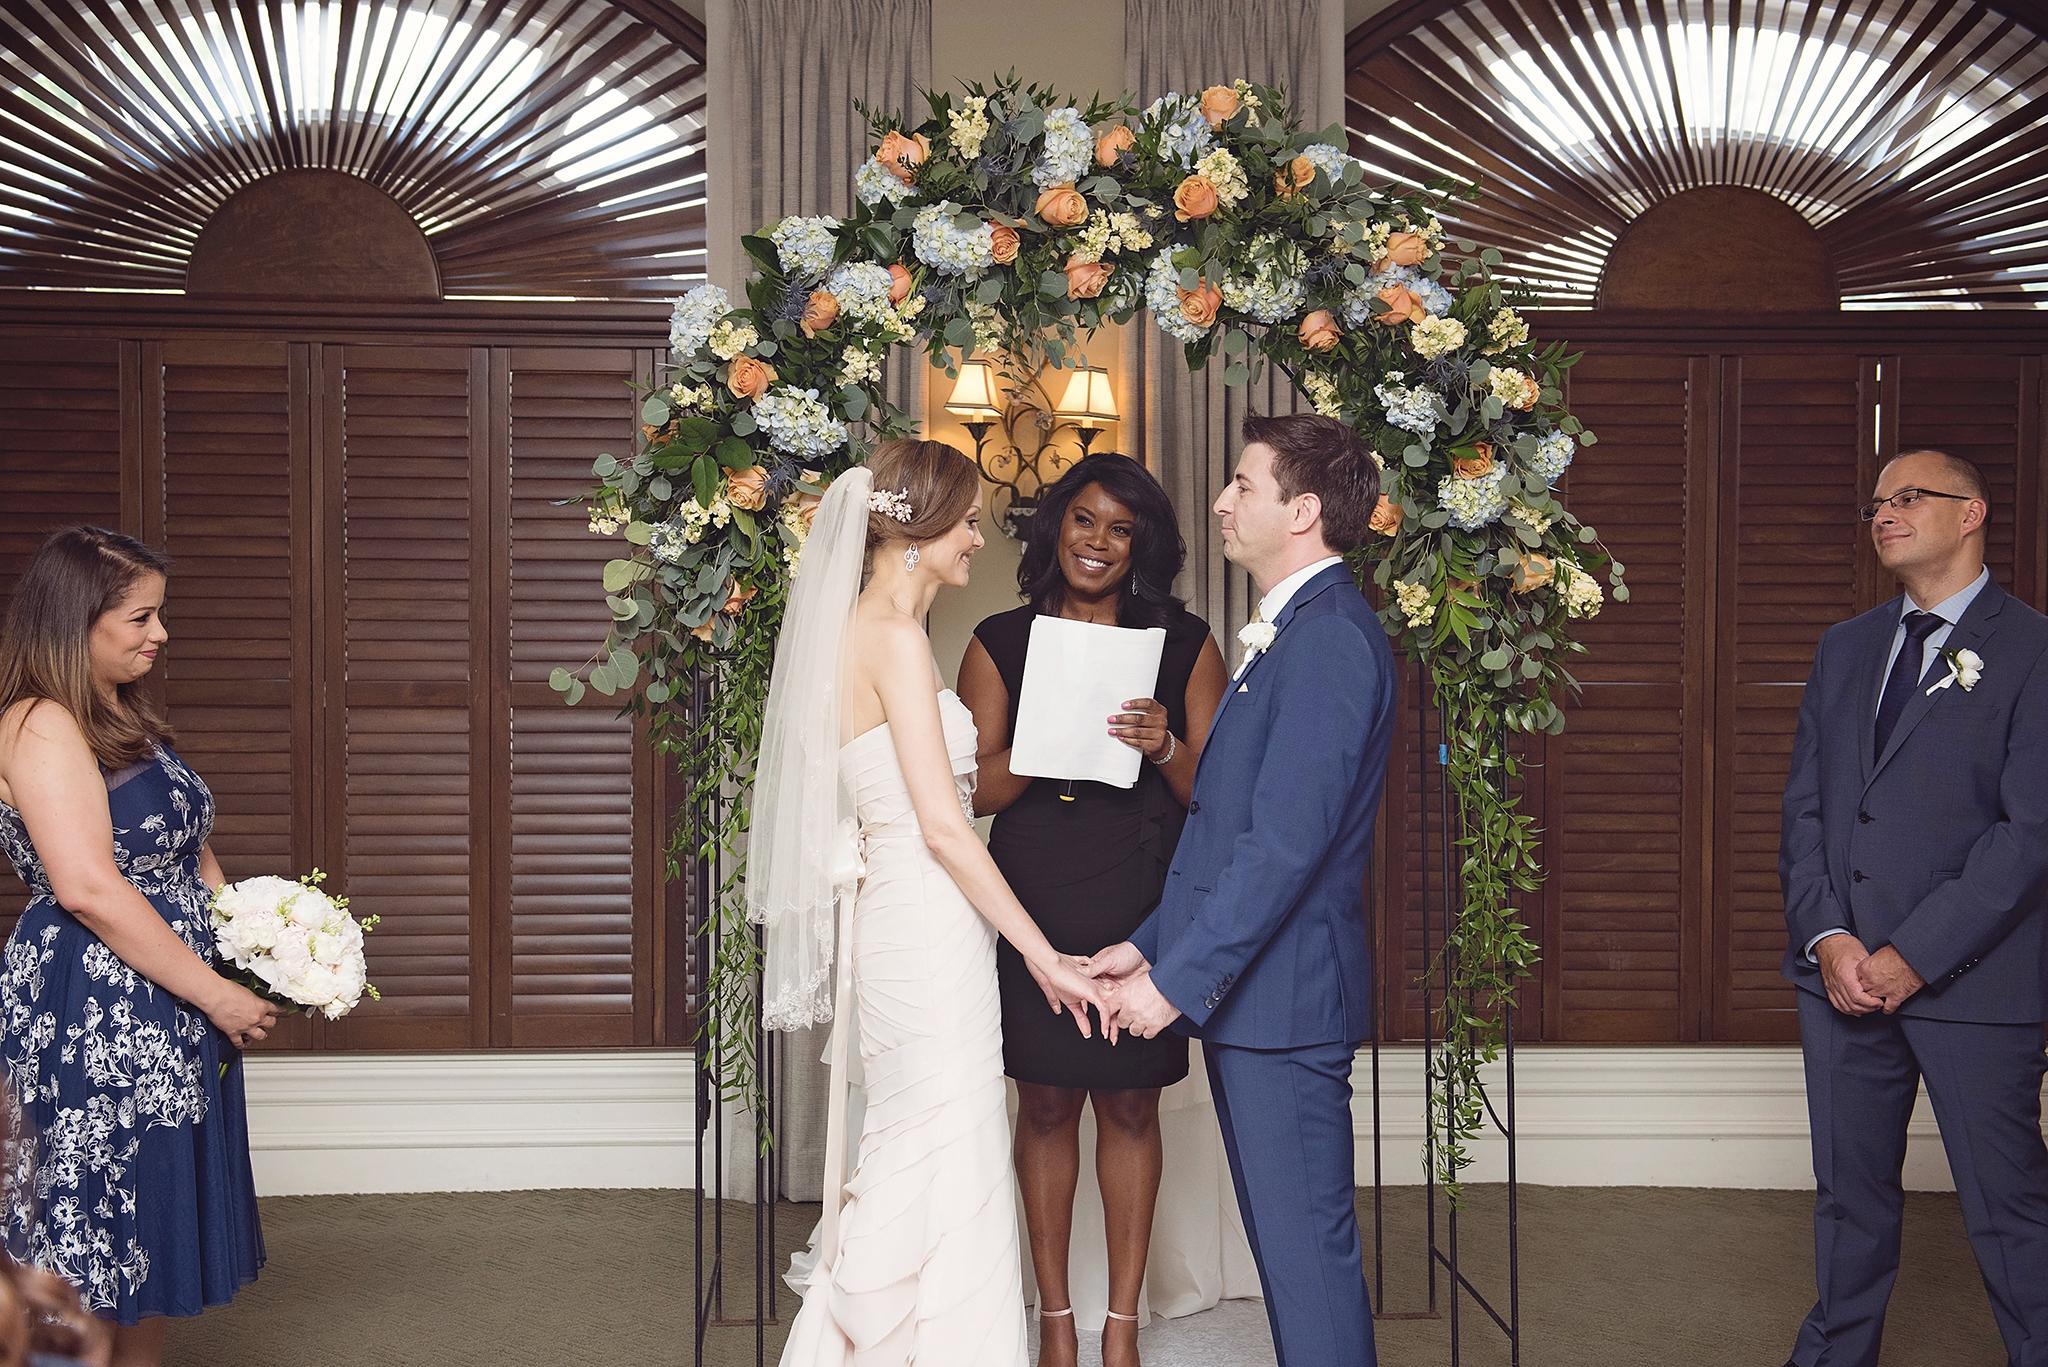 NJ-NY-wedding-photographer-030NJ-NY-wedding-photographer-030NJ-NY-WEDDING-PHOTOGRAPHER-030.JPG